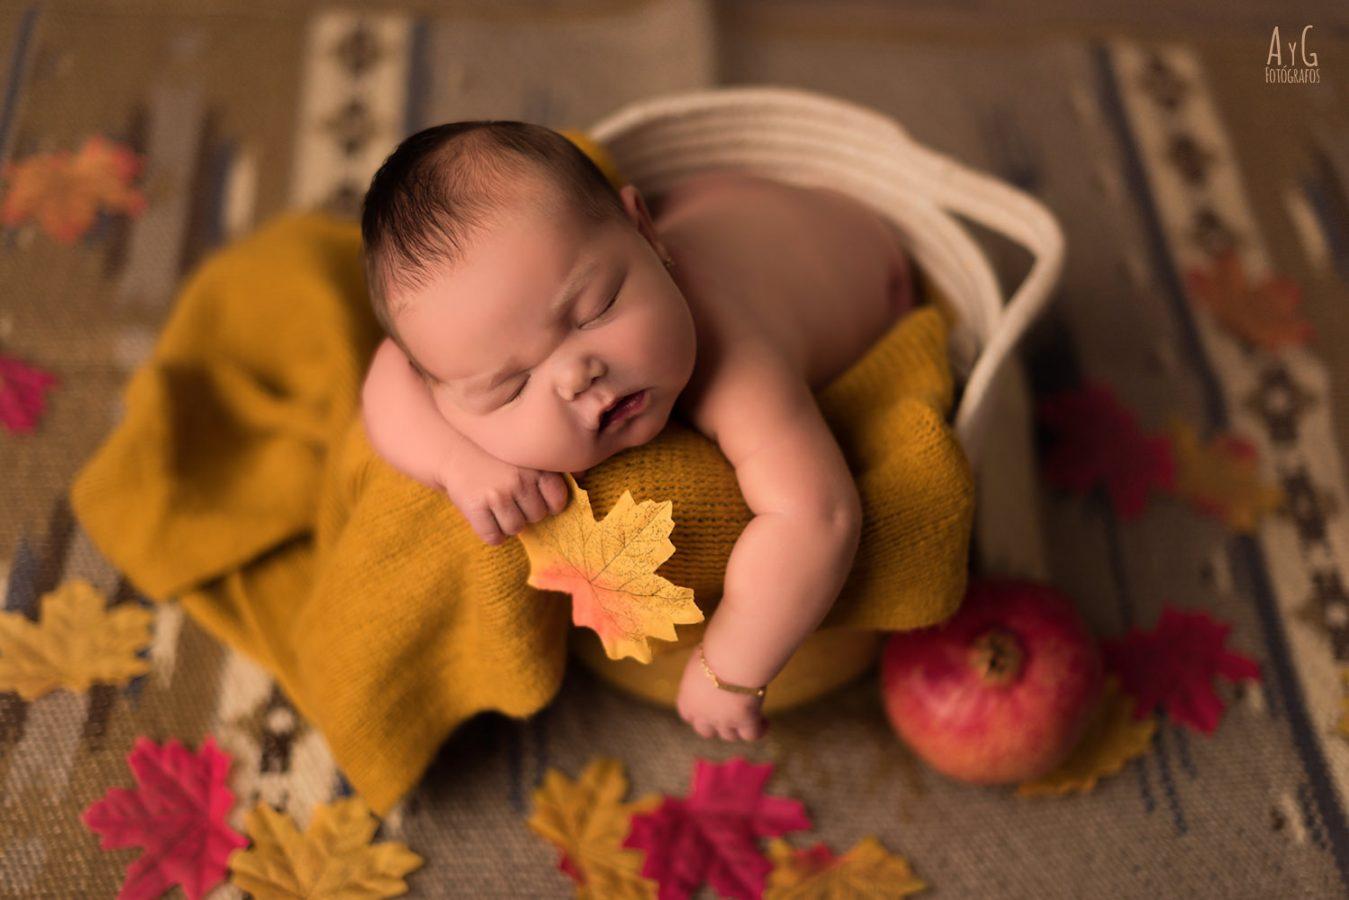 fotografia newborn, fotografía de recién nacido, fotografo cordoba, fotografo la carlota, fotografía de bebe, fotografía en estudio - La Carlota - Cordoba - 23